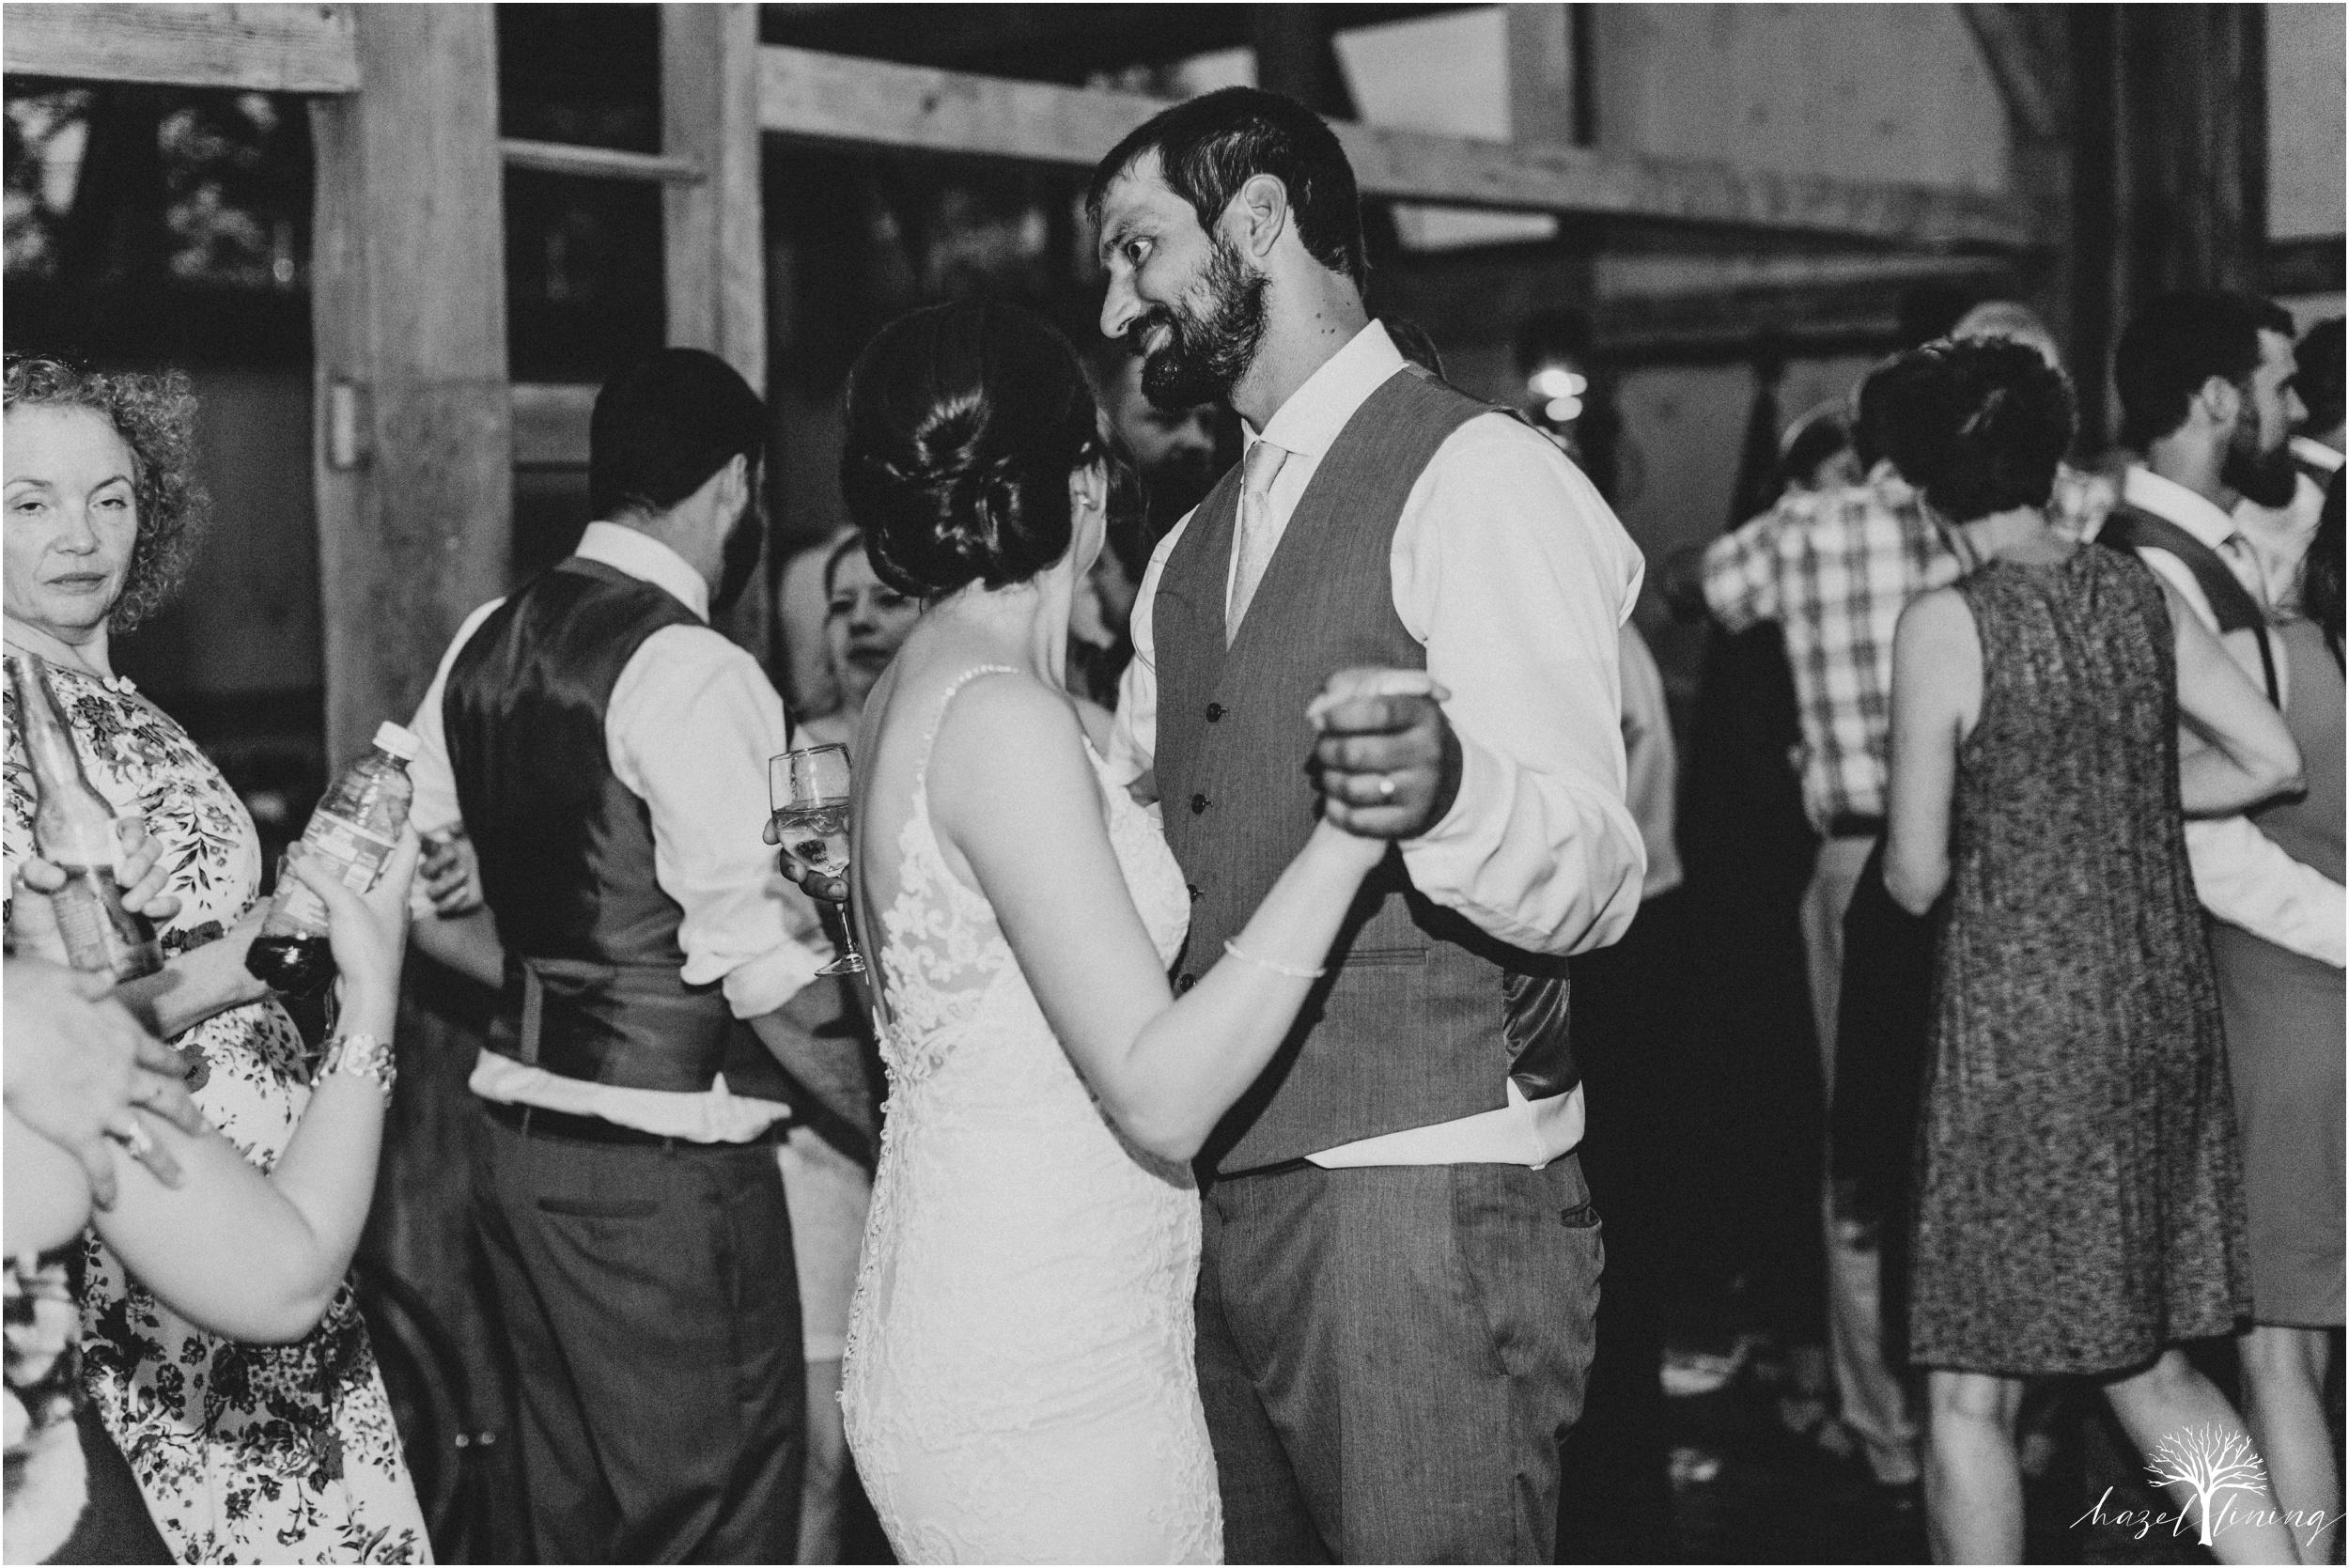 hazel-lining-travel-wedding-elopement-photography-lisa-landon-shoemaker-the-farm-bakery-and-events-bucks-county-quakertown-pennsylvania-summer-country-outdoor-farm-wedding_0174.jpg